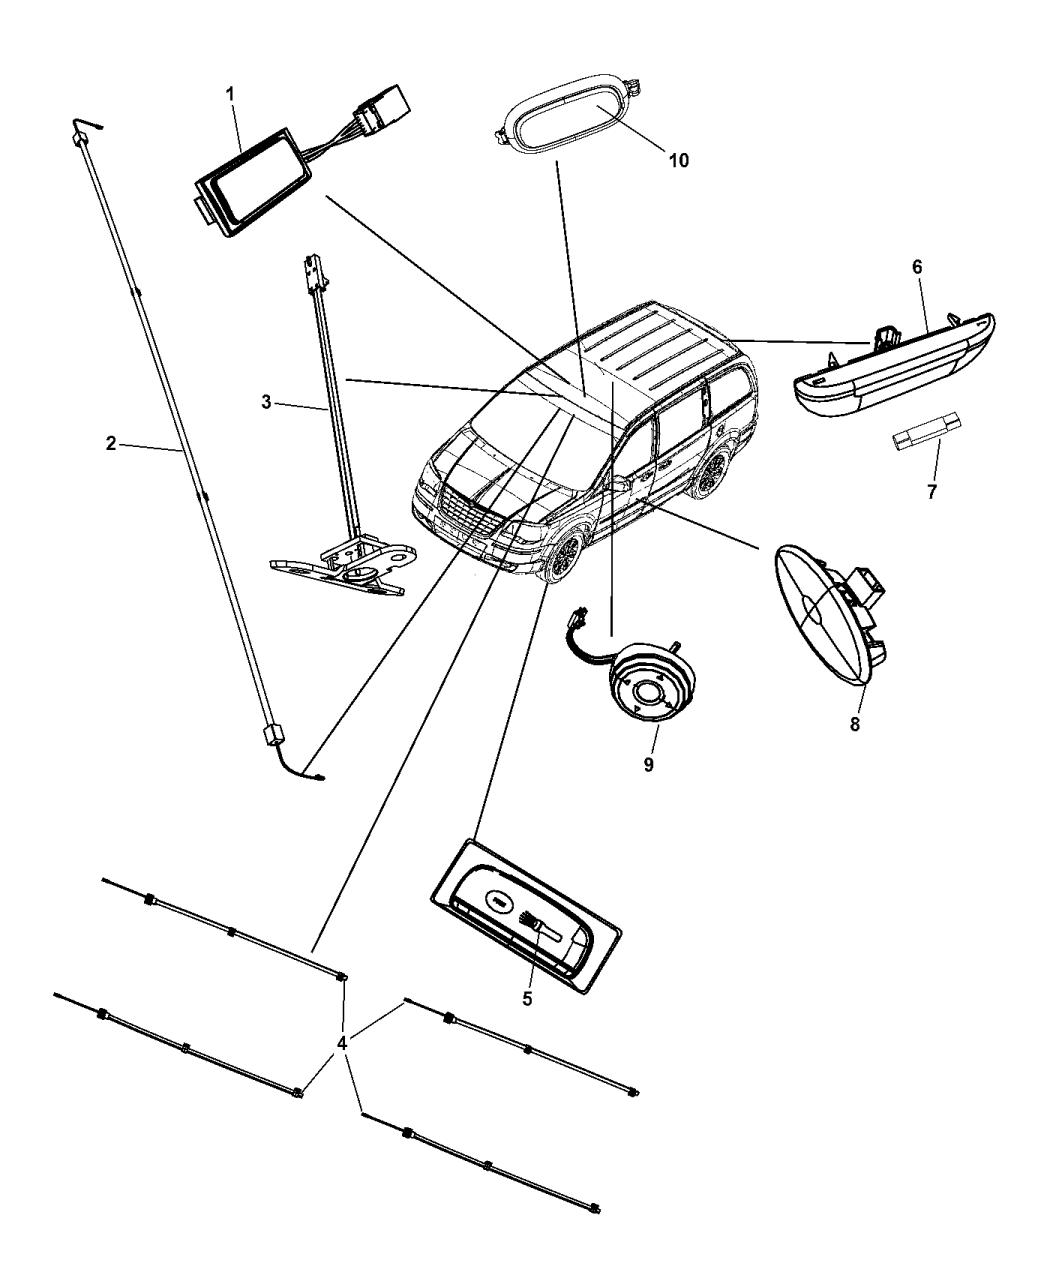 2015 Dodge Grand Caravan Lamps Interior Mopar Parts Giant 2014 Wiring Diagram